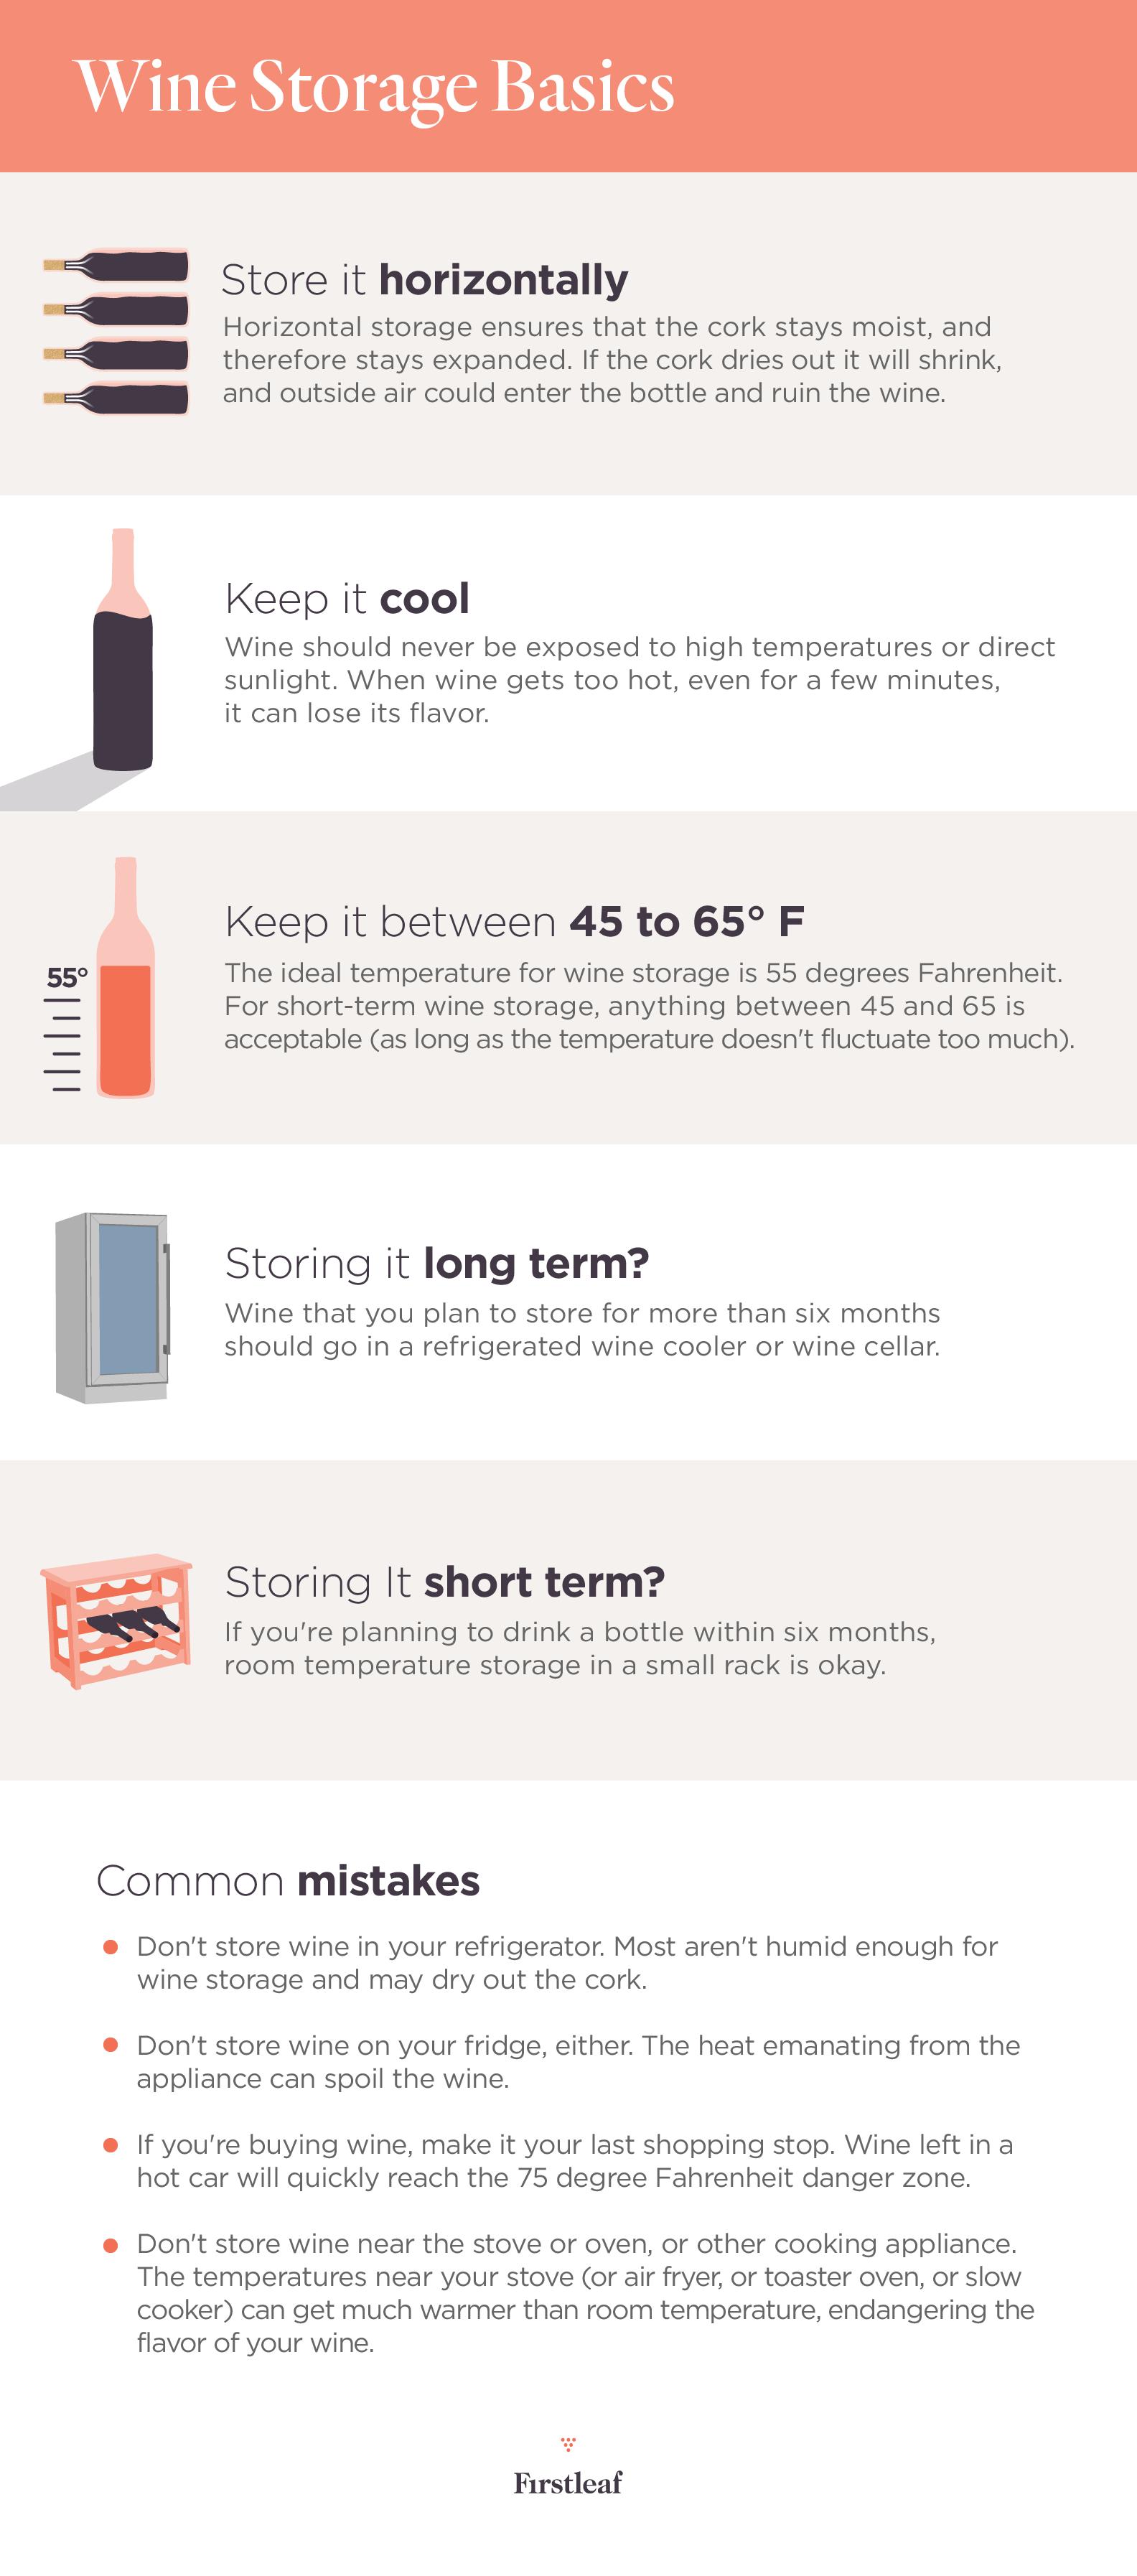 how to build wine storage